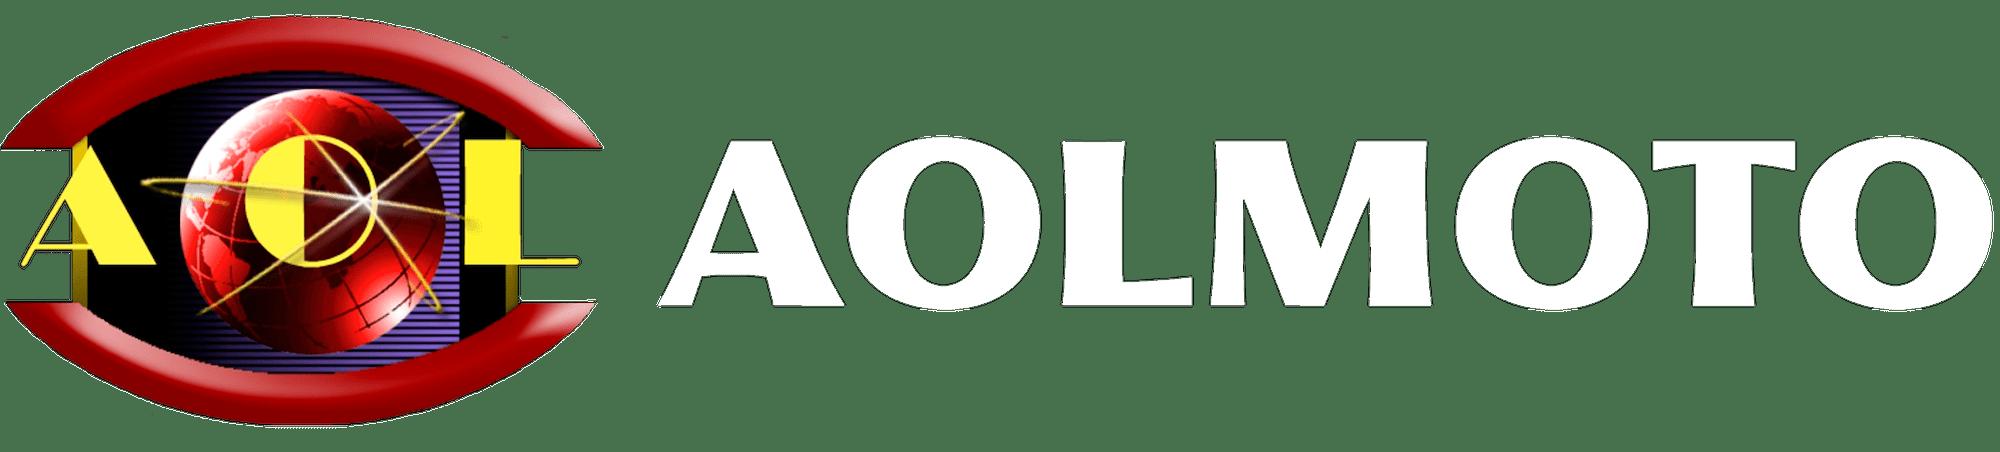 Aolmoto